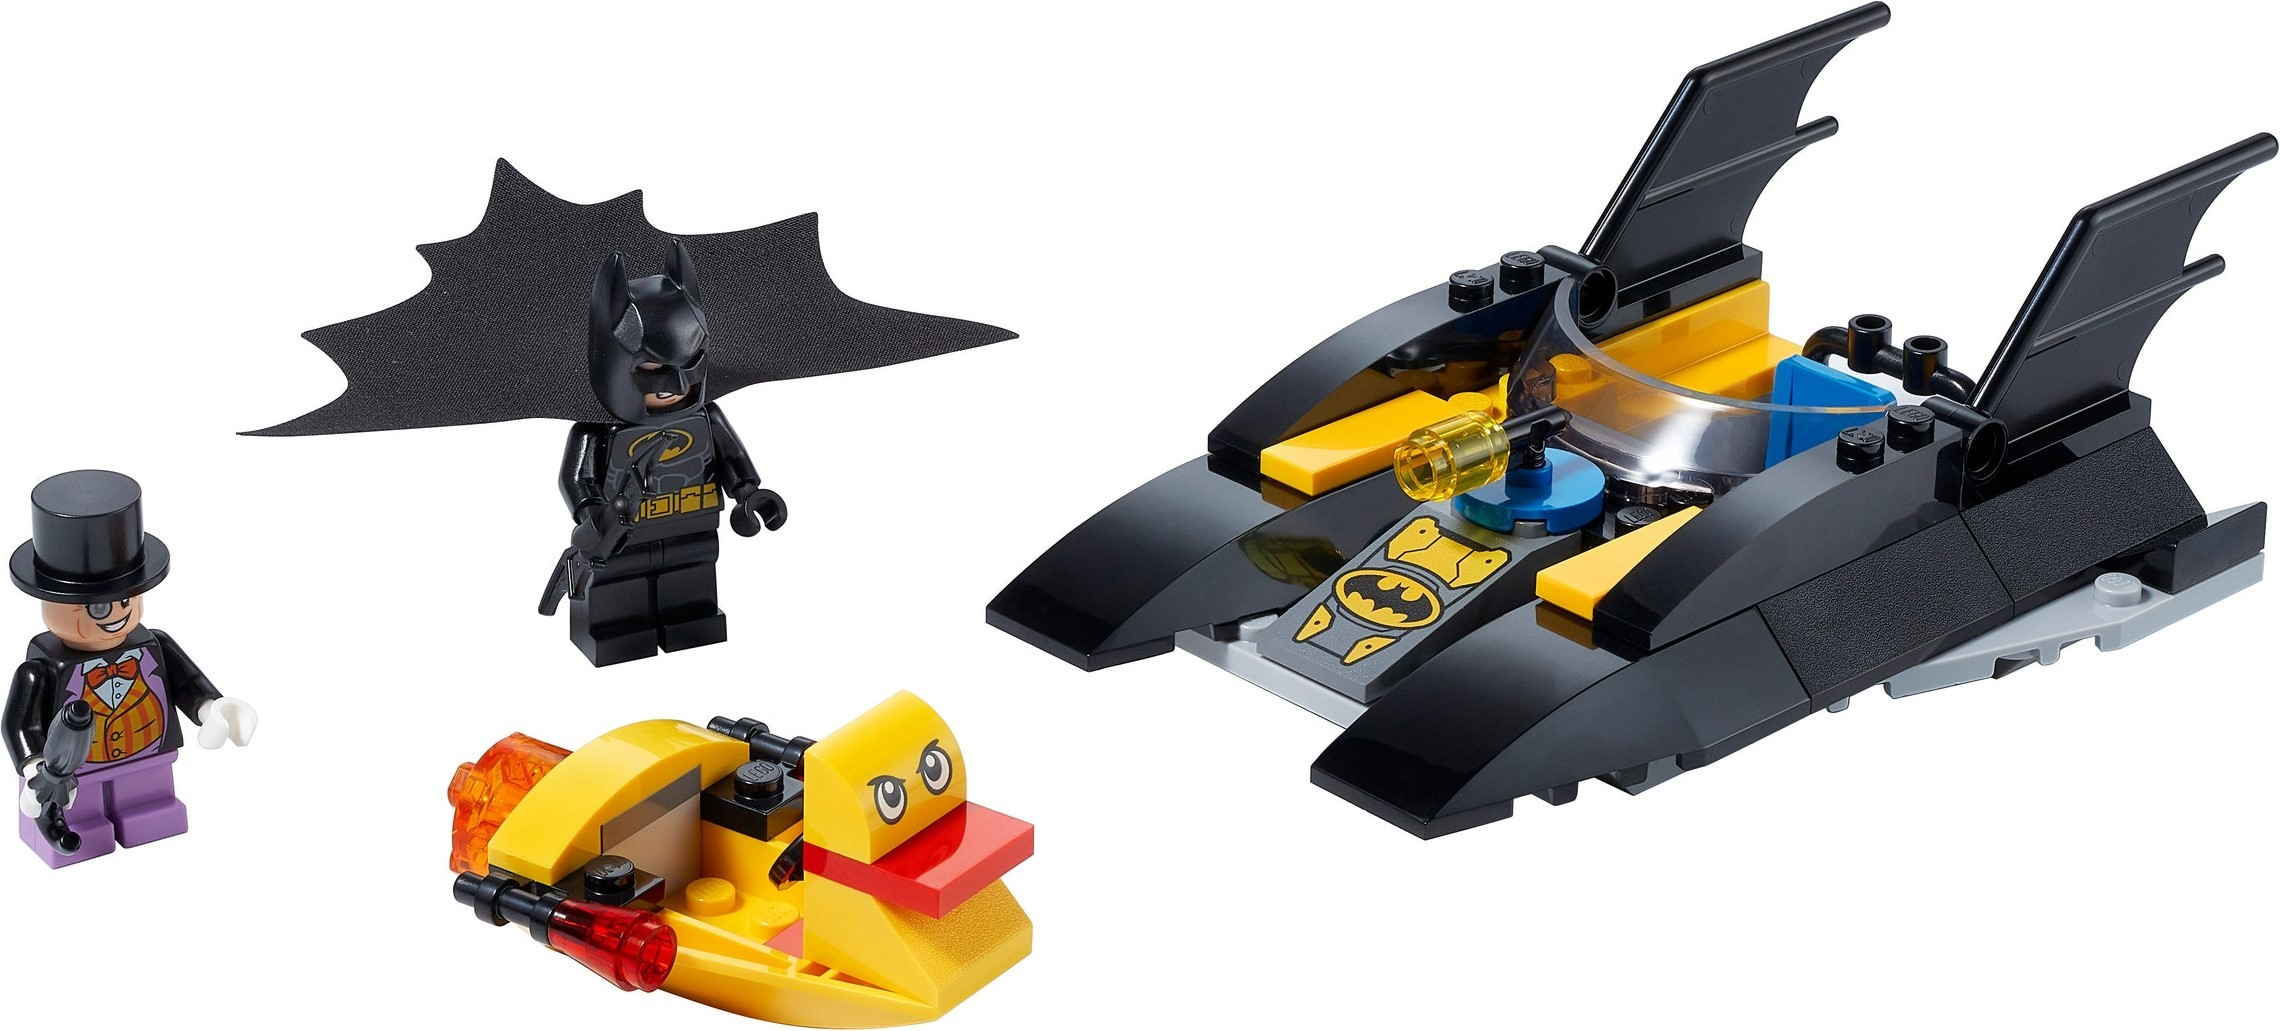 Max Minifigs 76157 sh636 Super Heroes LEGO®